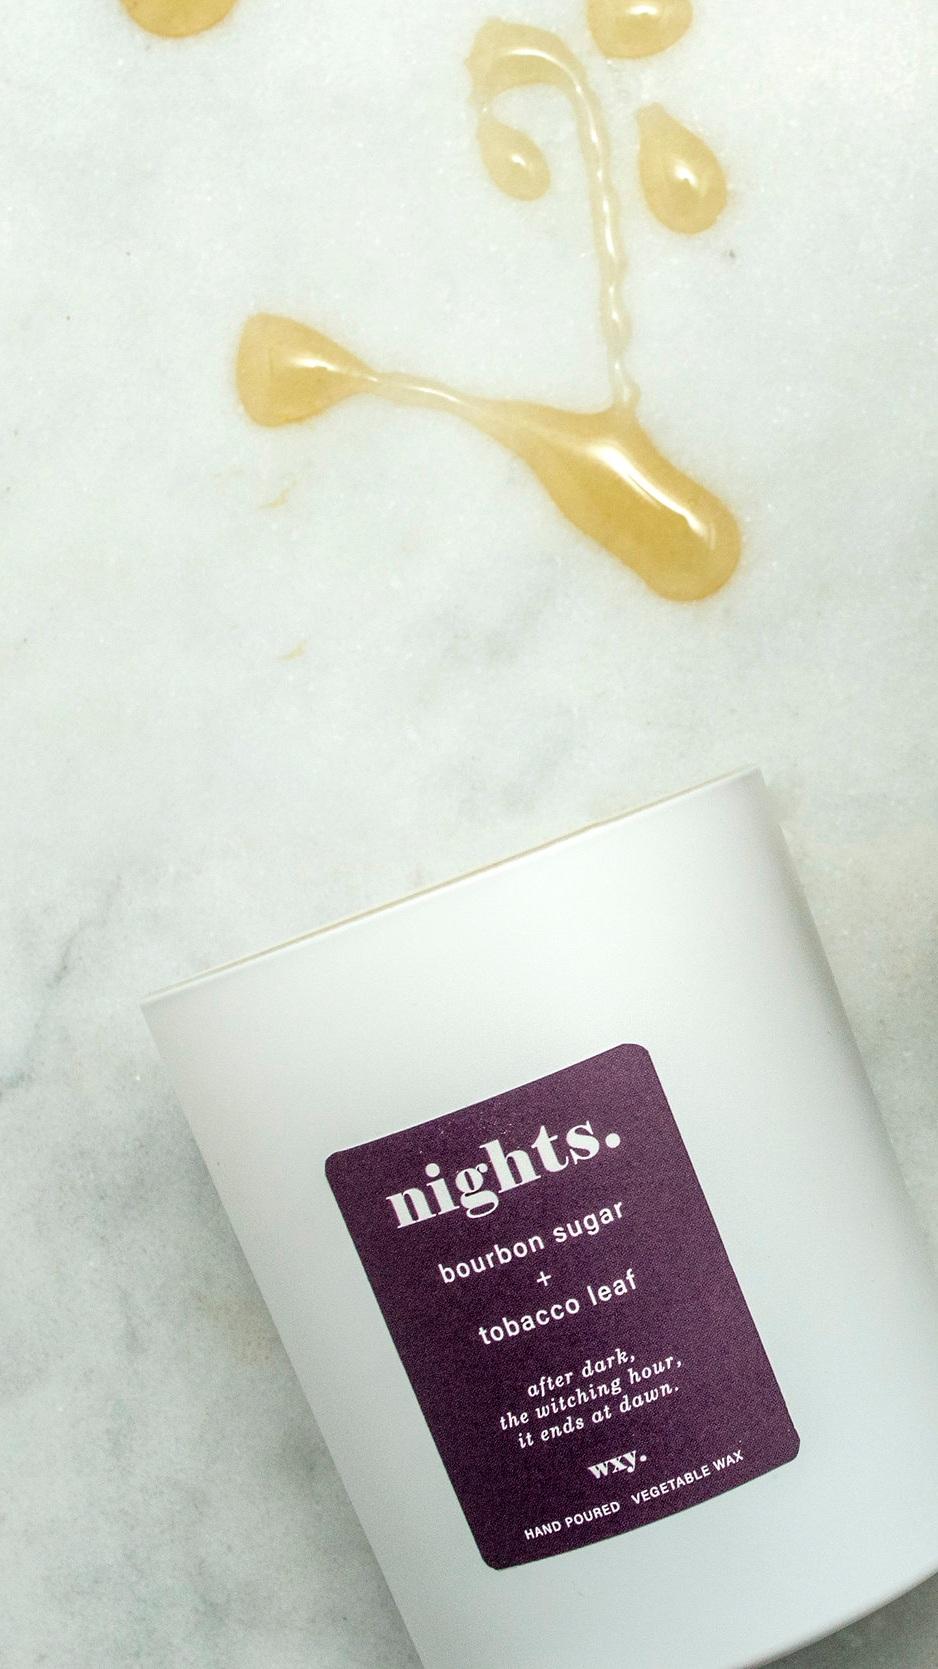 Nights+-+Candle+Lifestyle.jpg